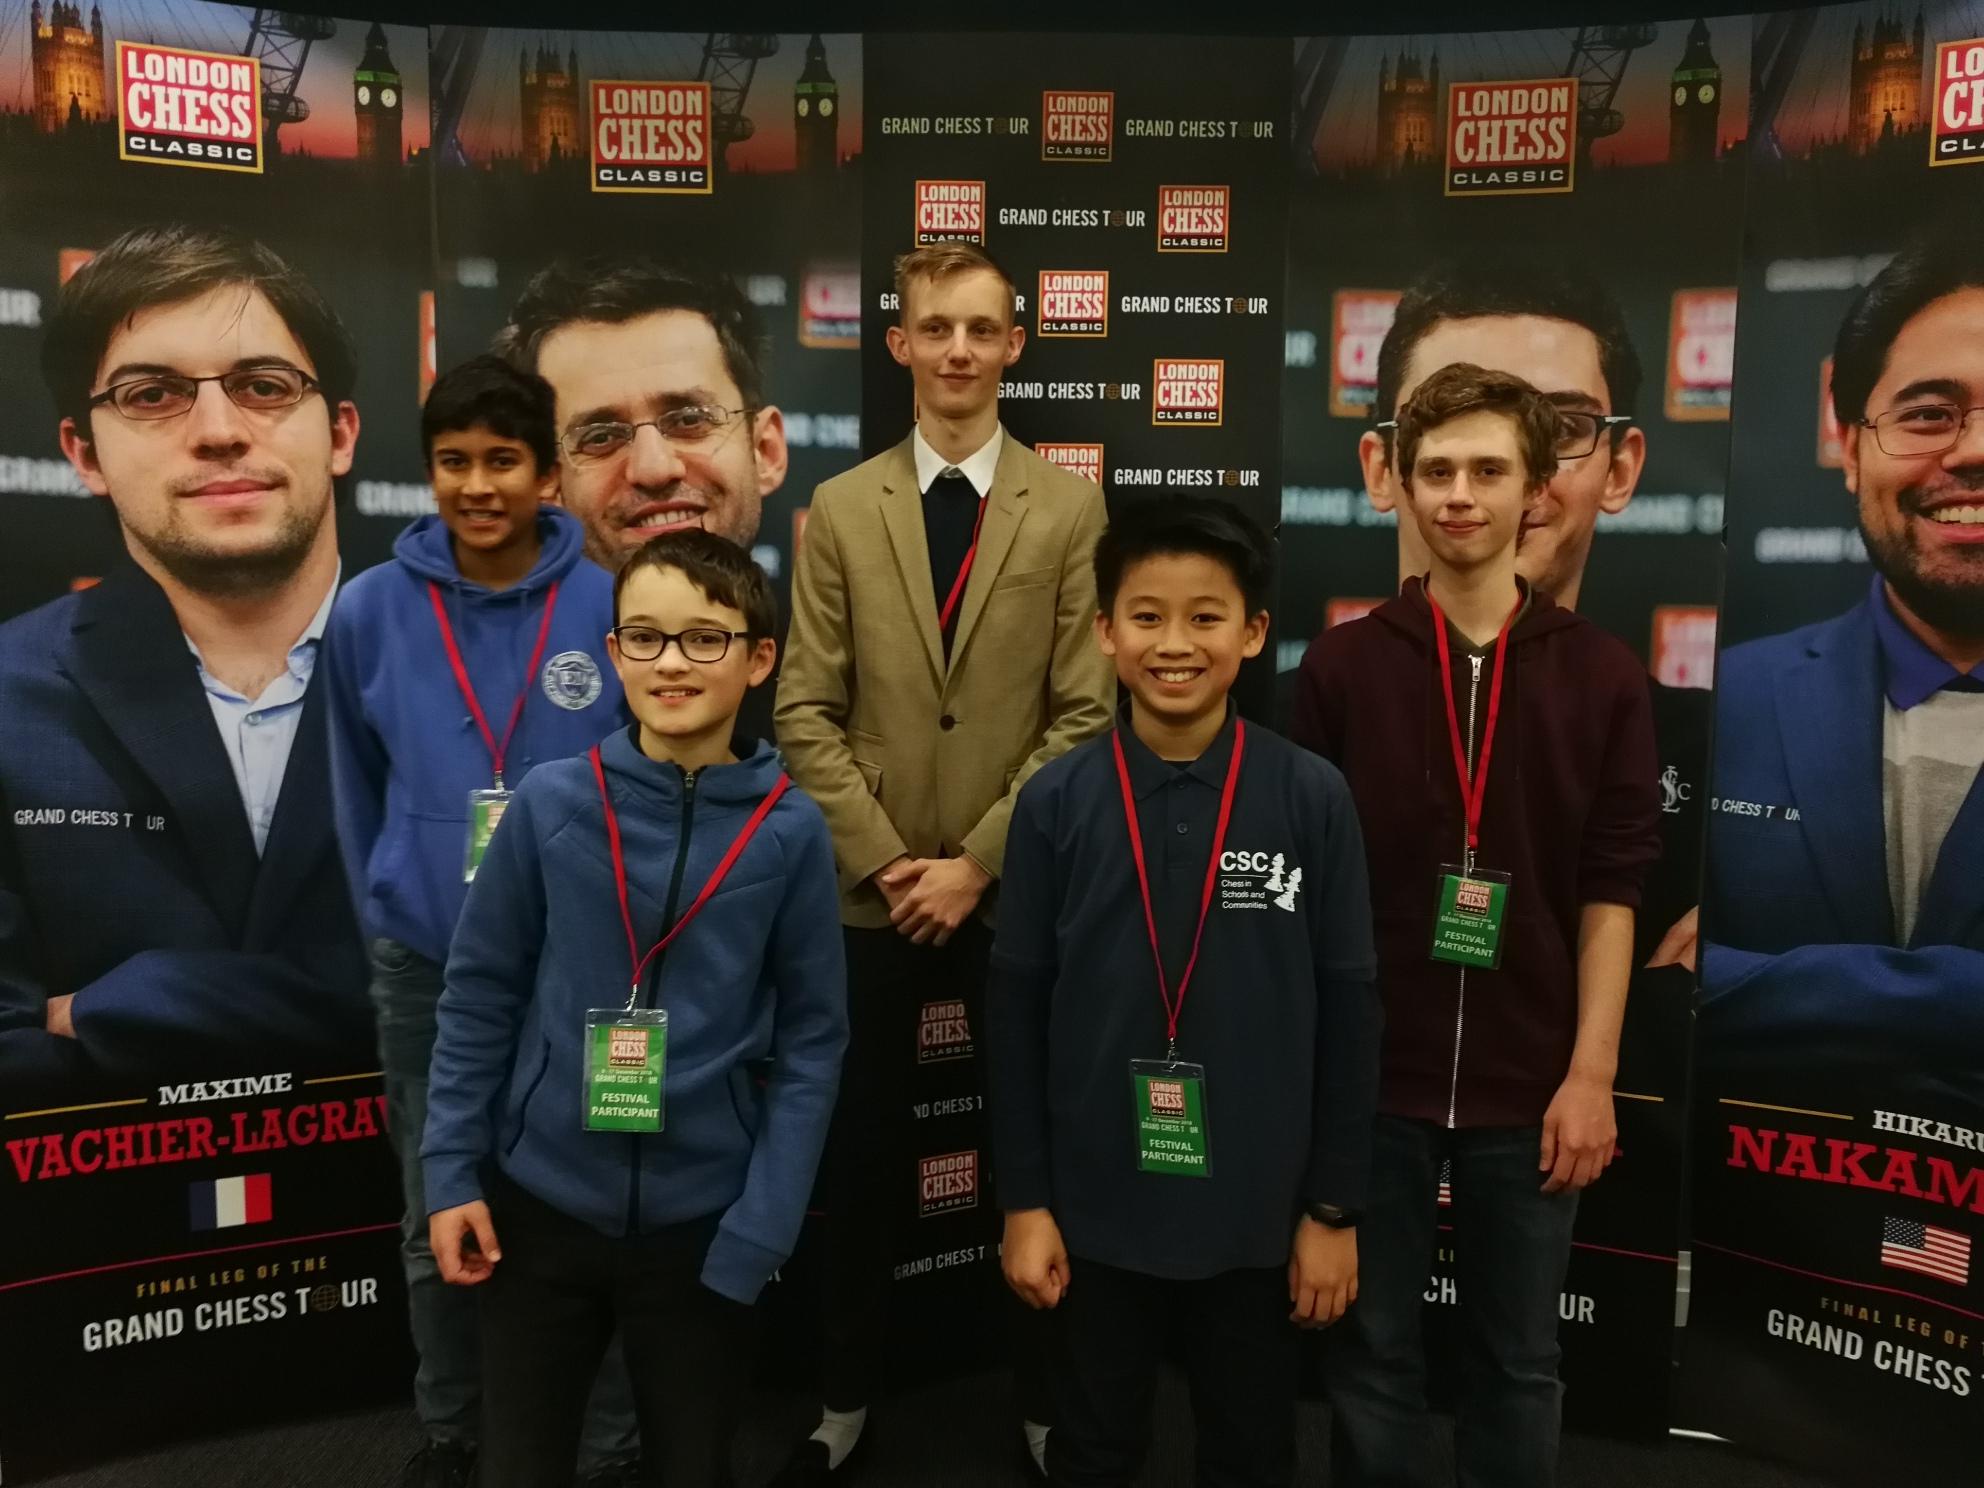 London Chess Classics 2018